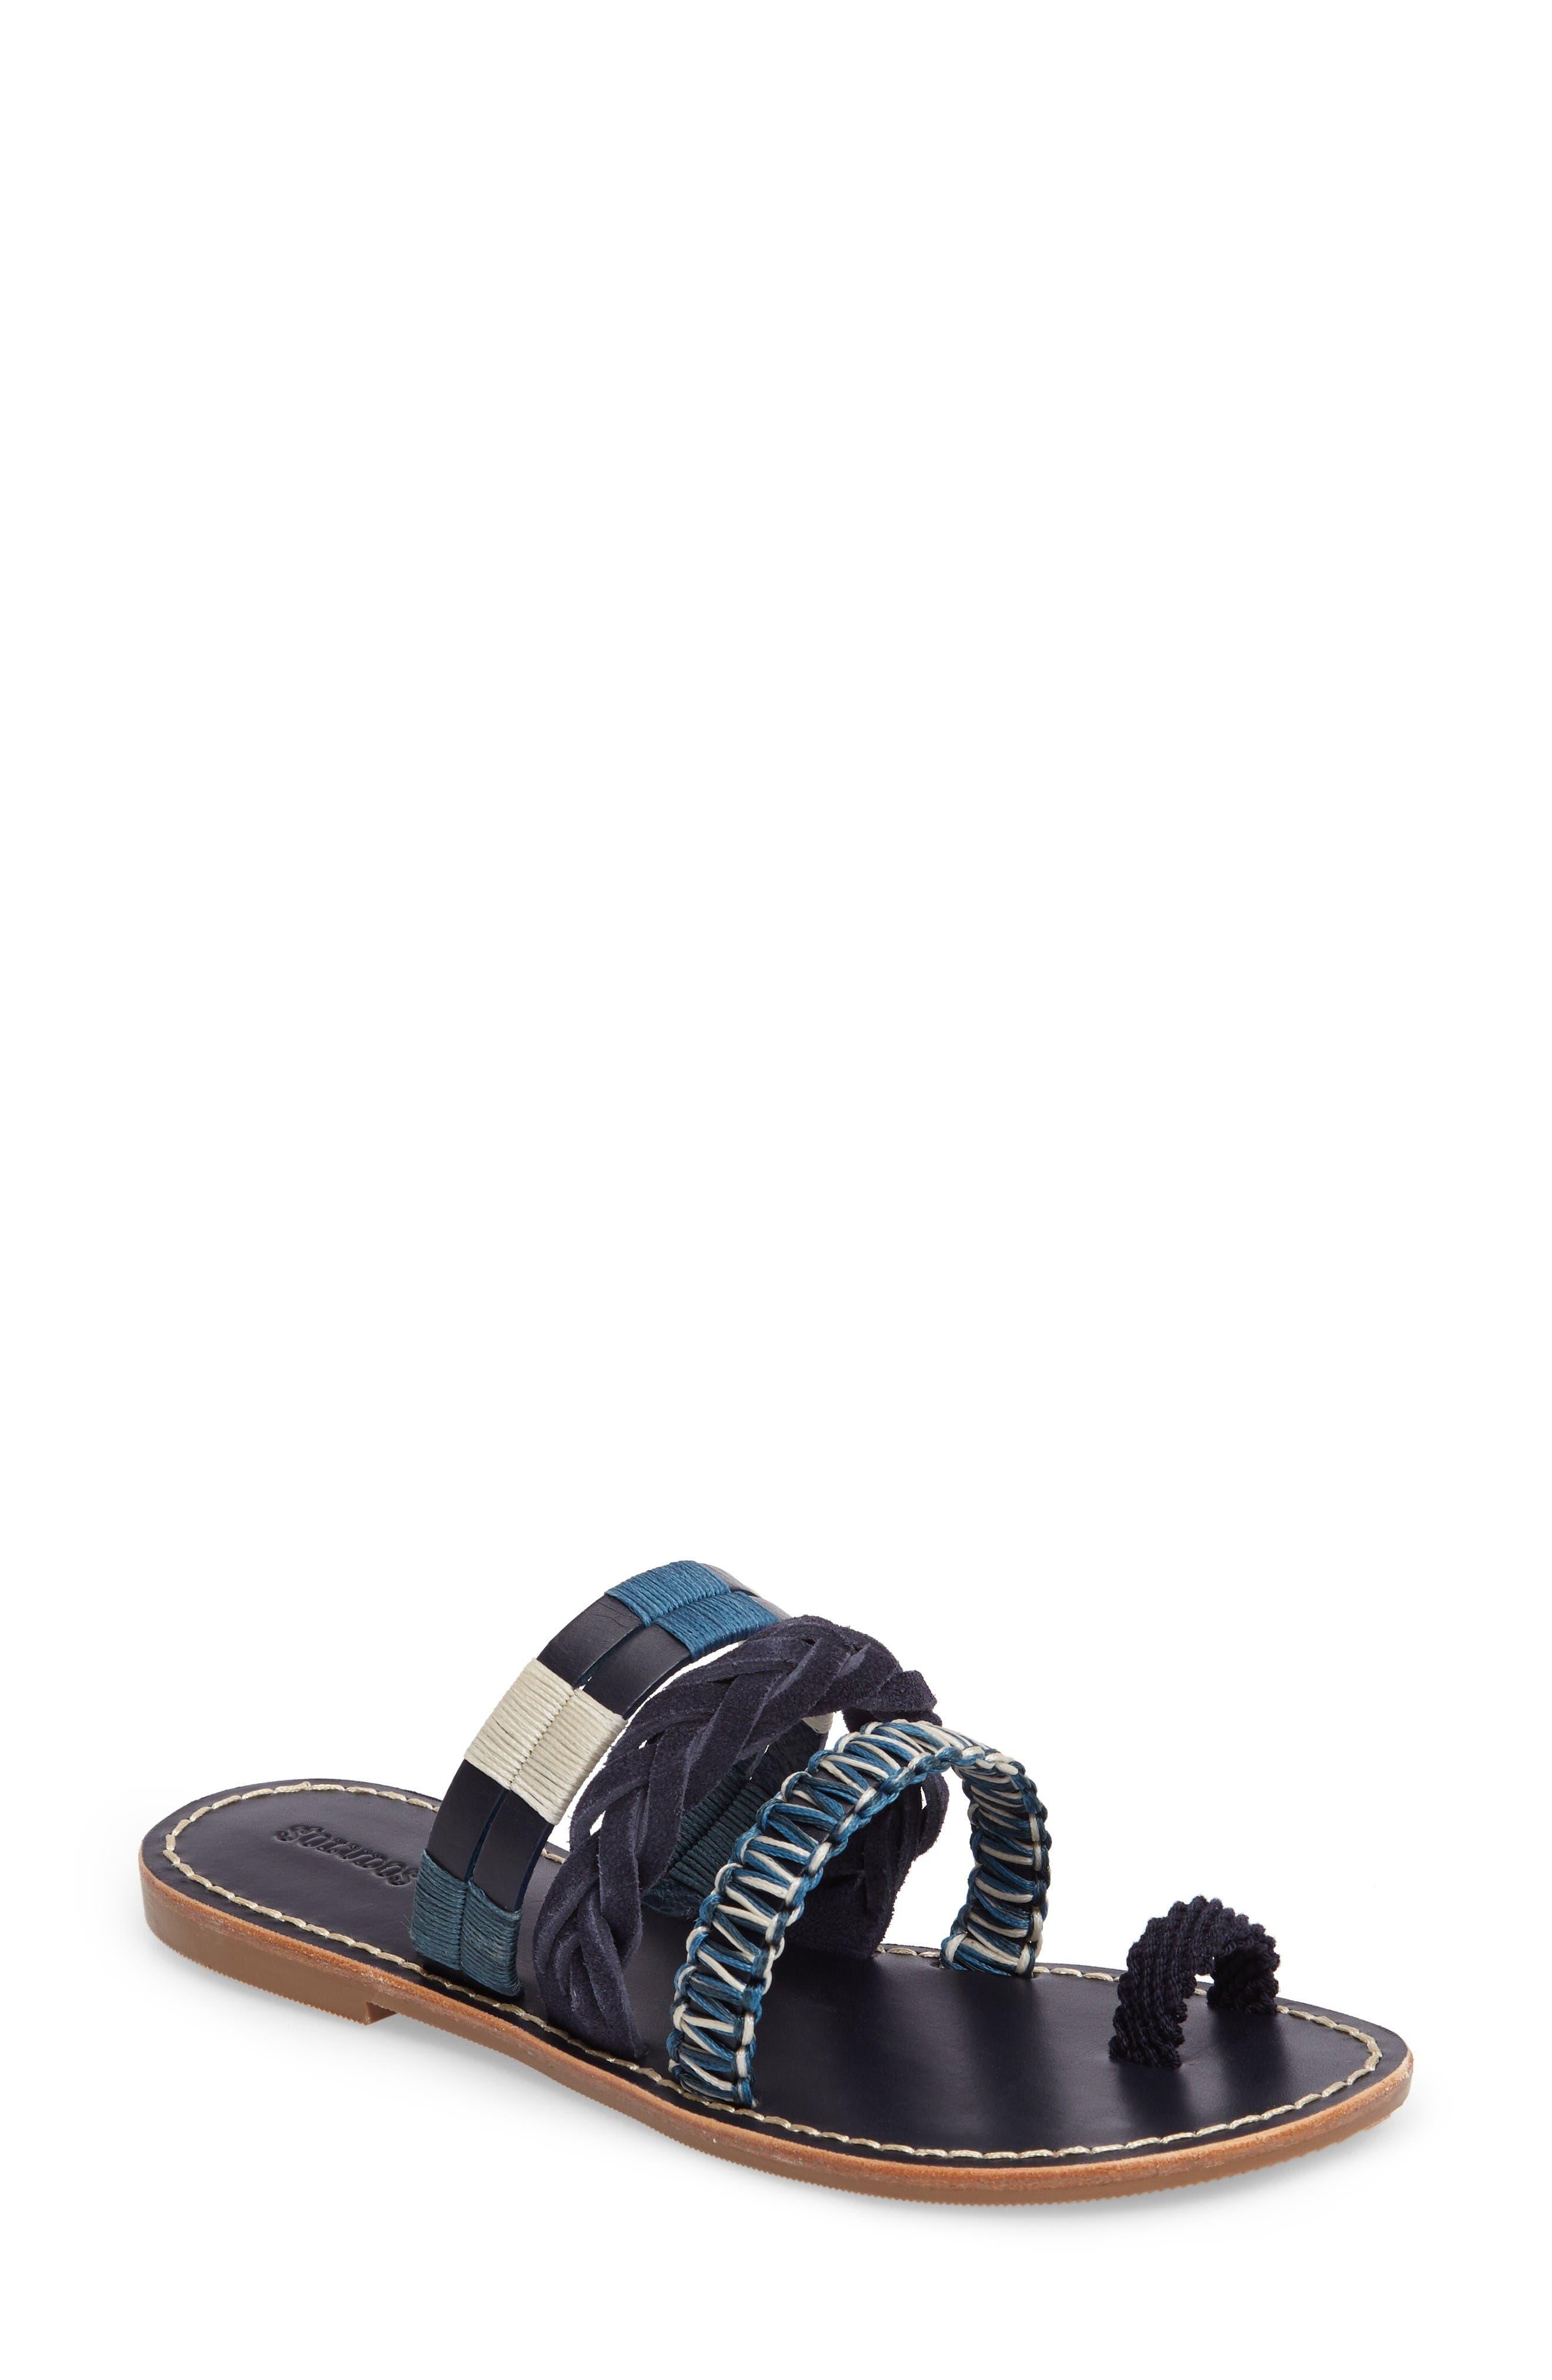 Slide Sandal,                         Main,                         color, Midnight/ Blue Multi Leather